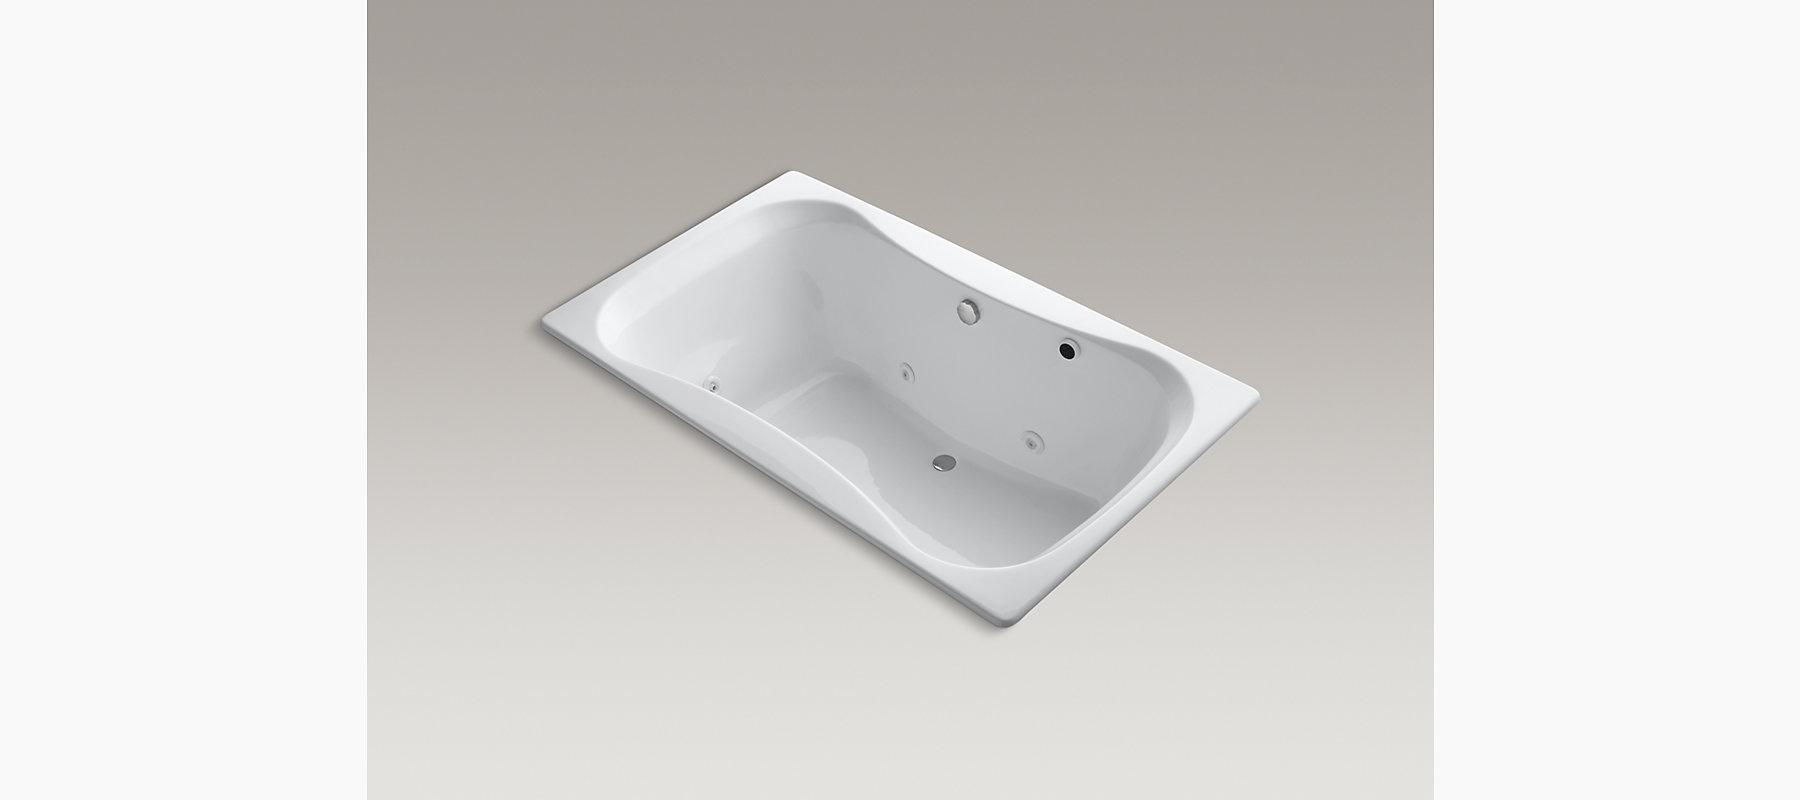 KOHLER| Infinity Bath 6-Foot Whirlpool with Left-Hand Pump | KOHLER